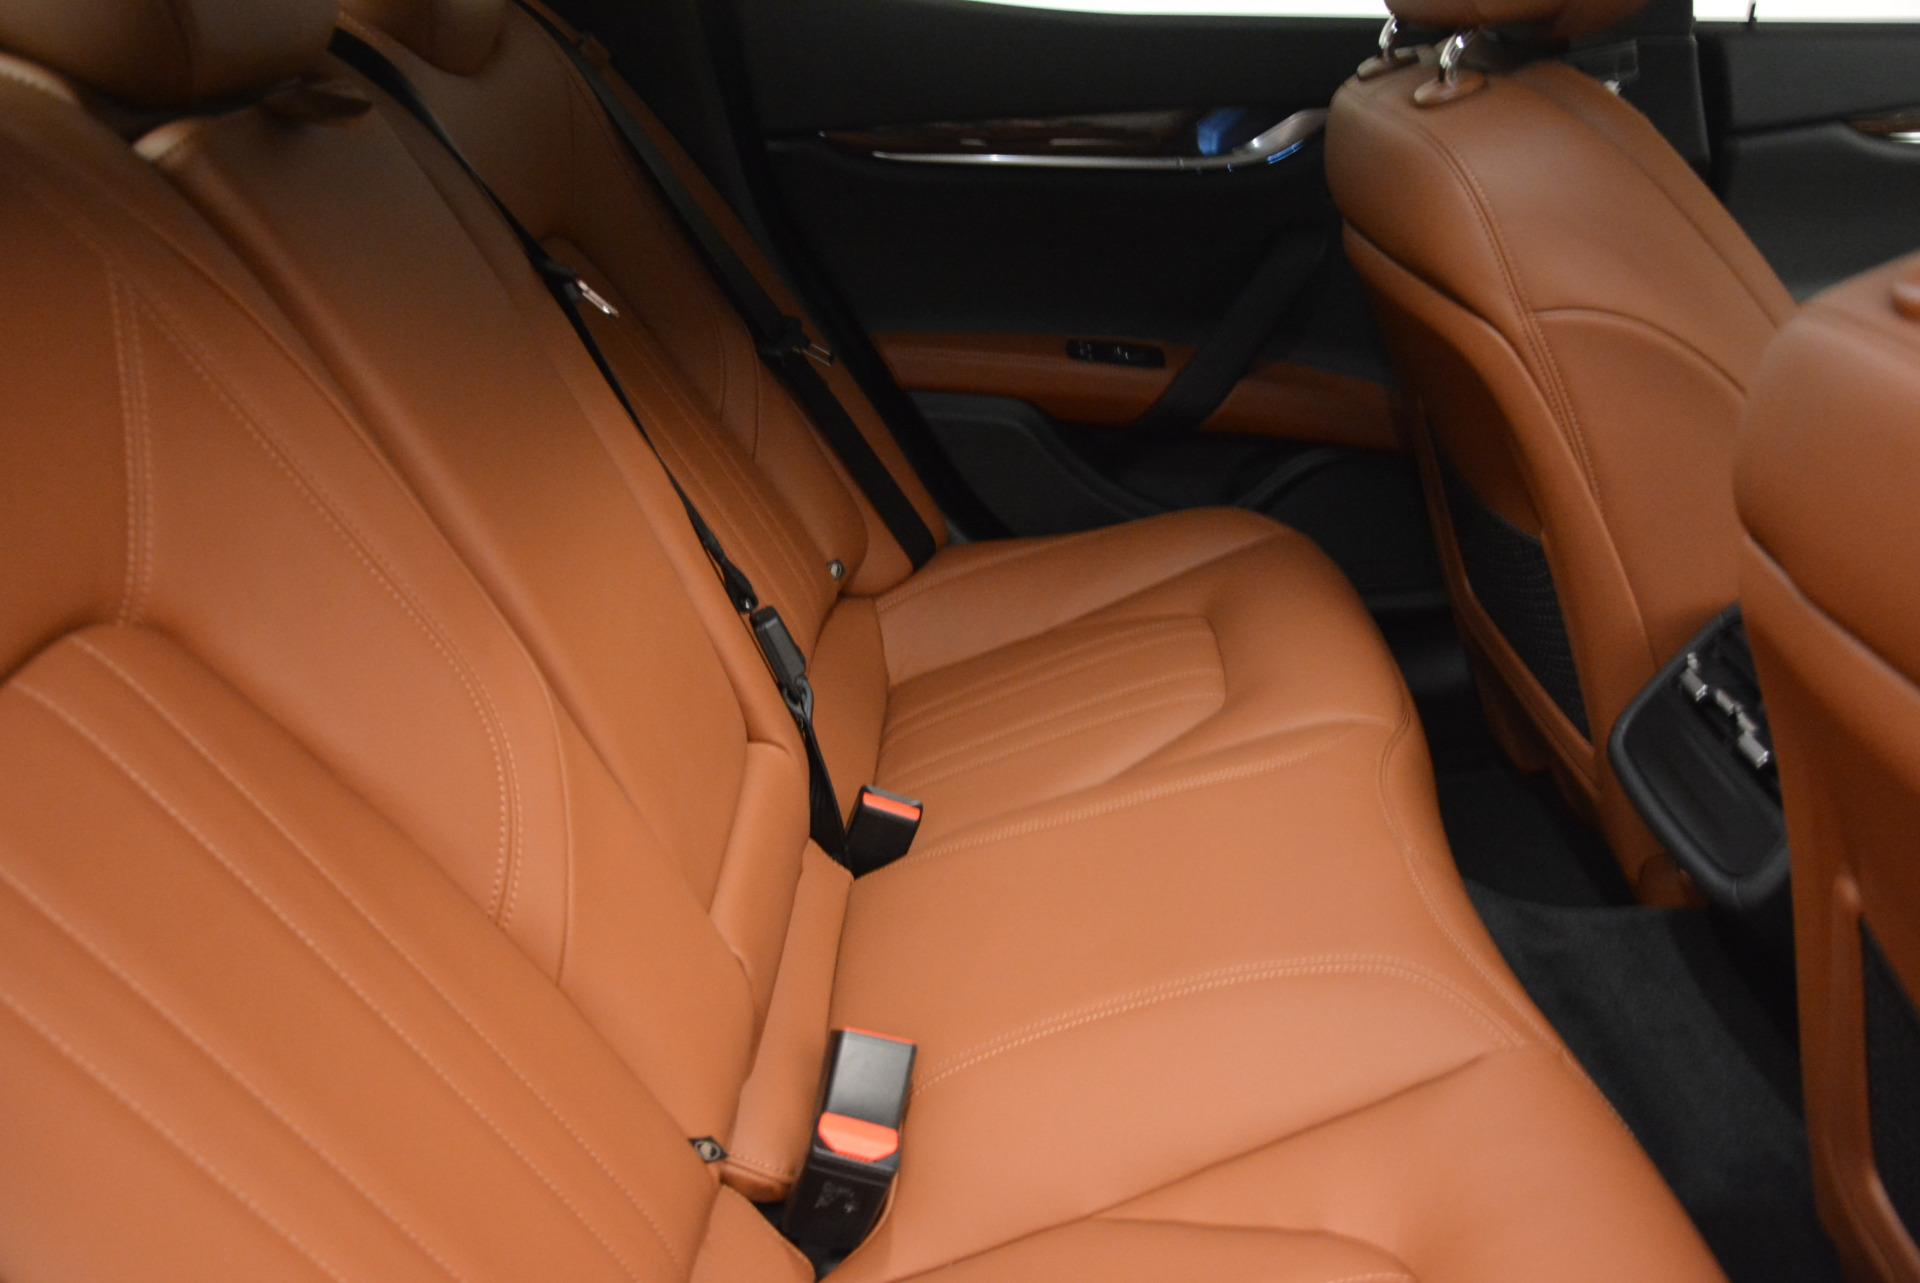 Used 2017 Maserati Ghibli S Q4  EX-LOANER For Sale In Greenwich, CT. Alfa Romeo of Greenwich, W311 565_p23